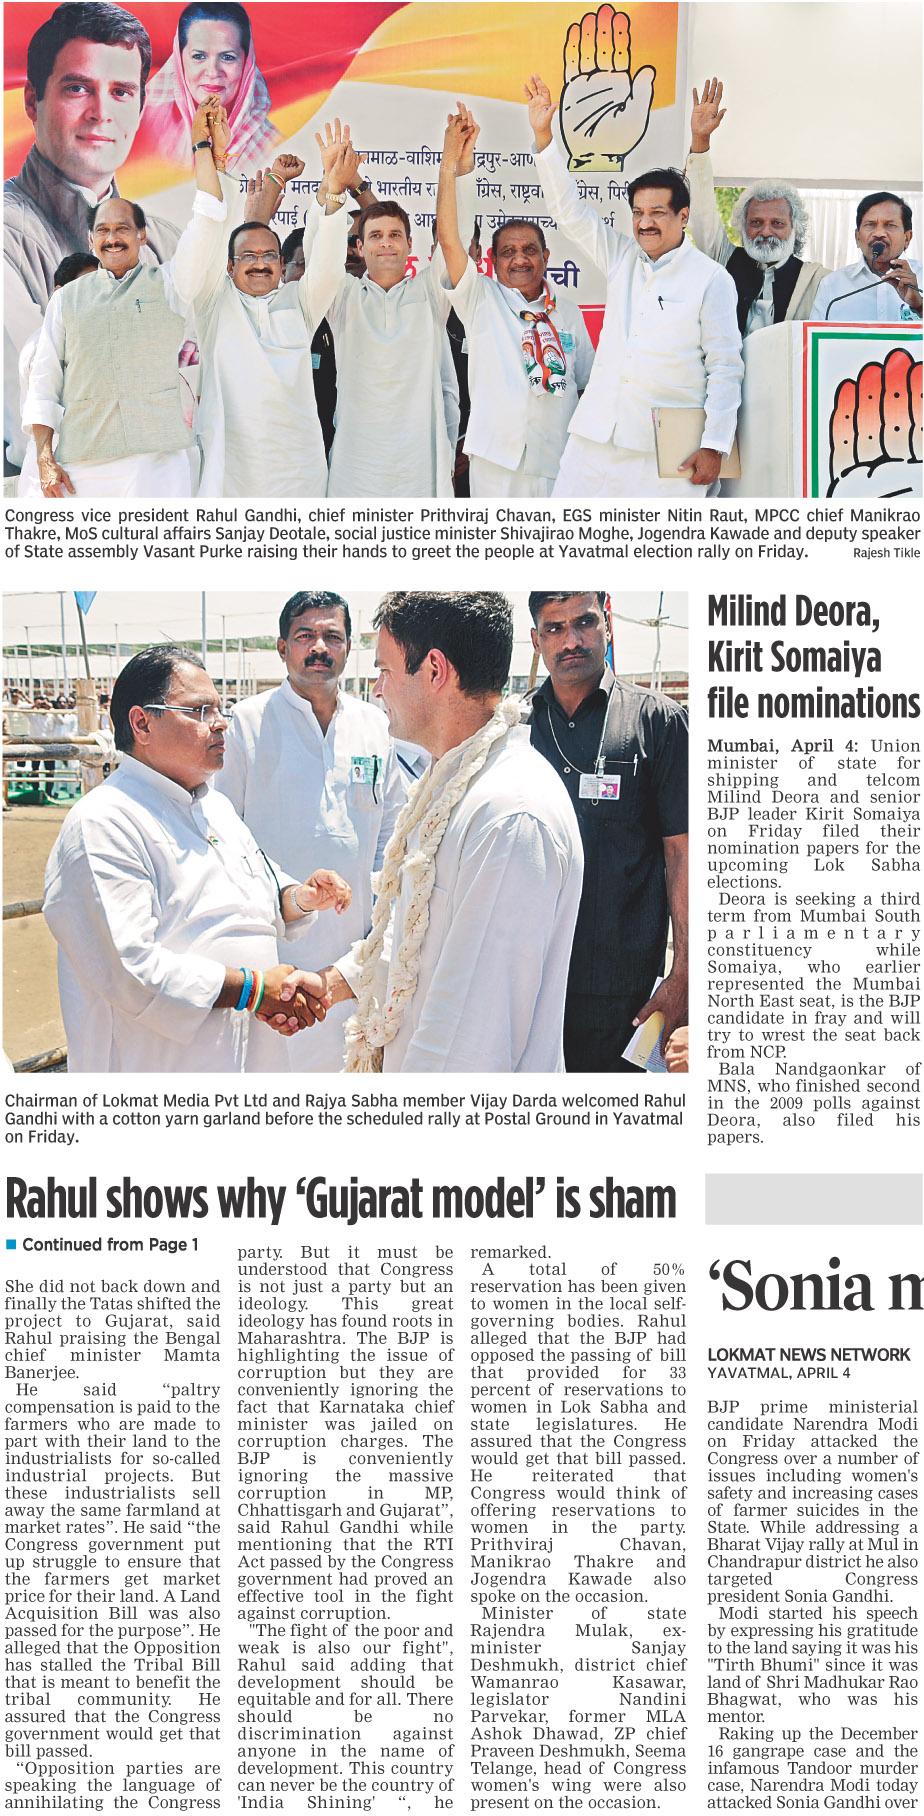 Rahul show why 'Gujarat model' is sham